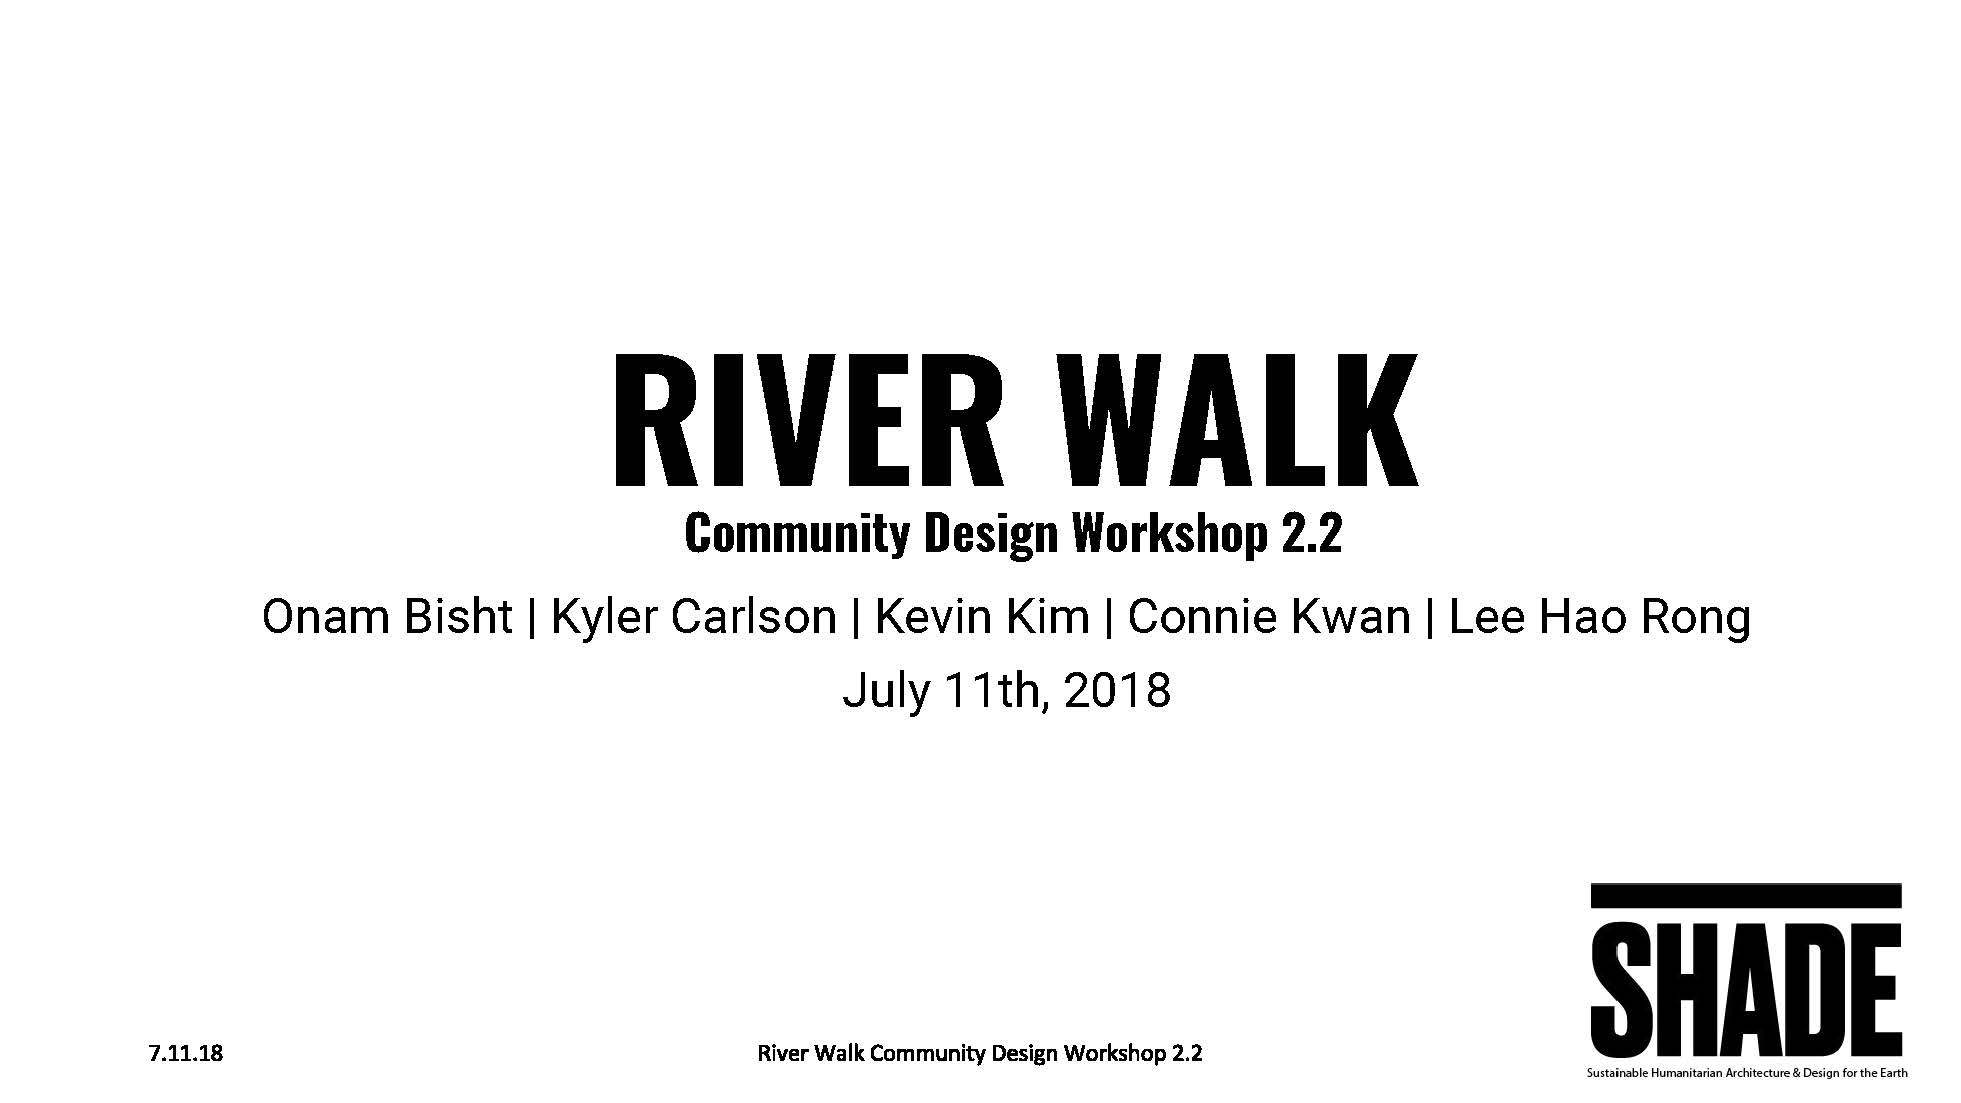 River Walk CDW 7.11.18 (1)_Page_01.jpg